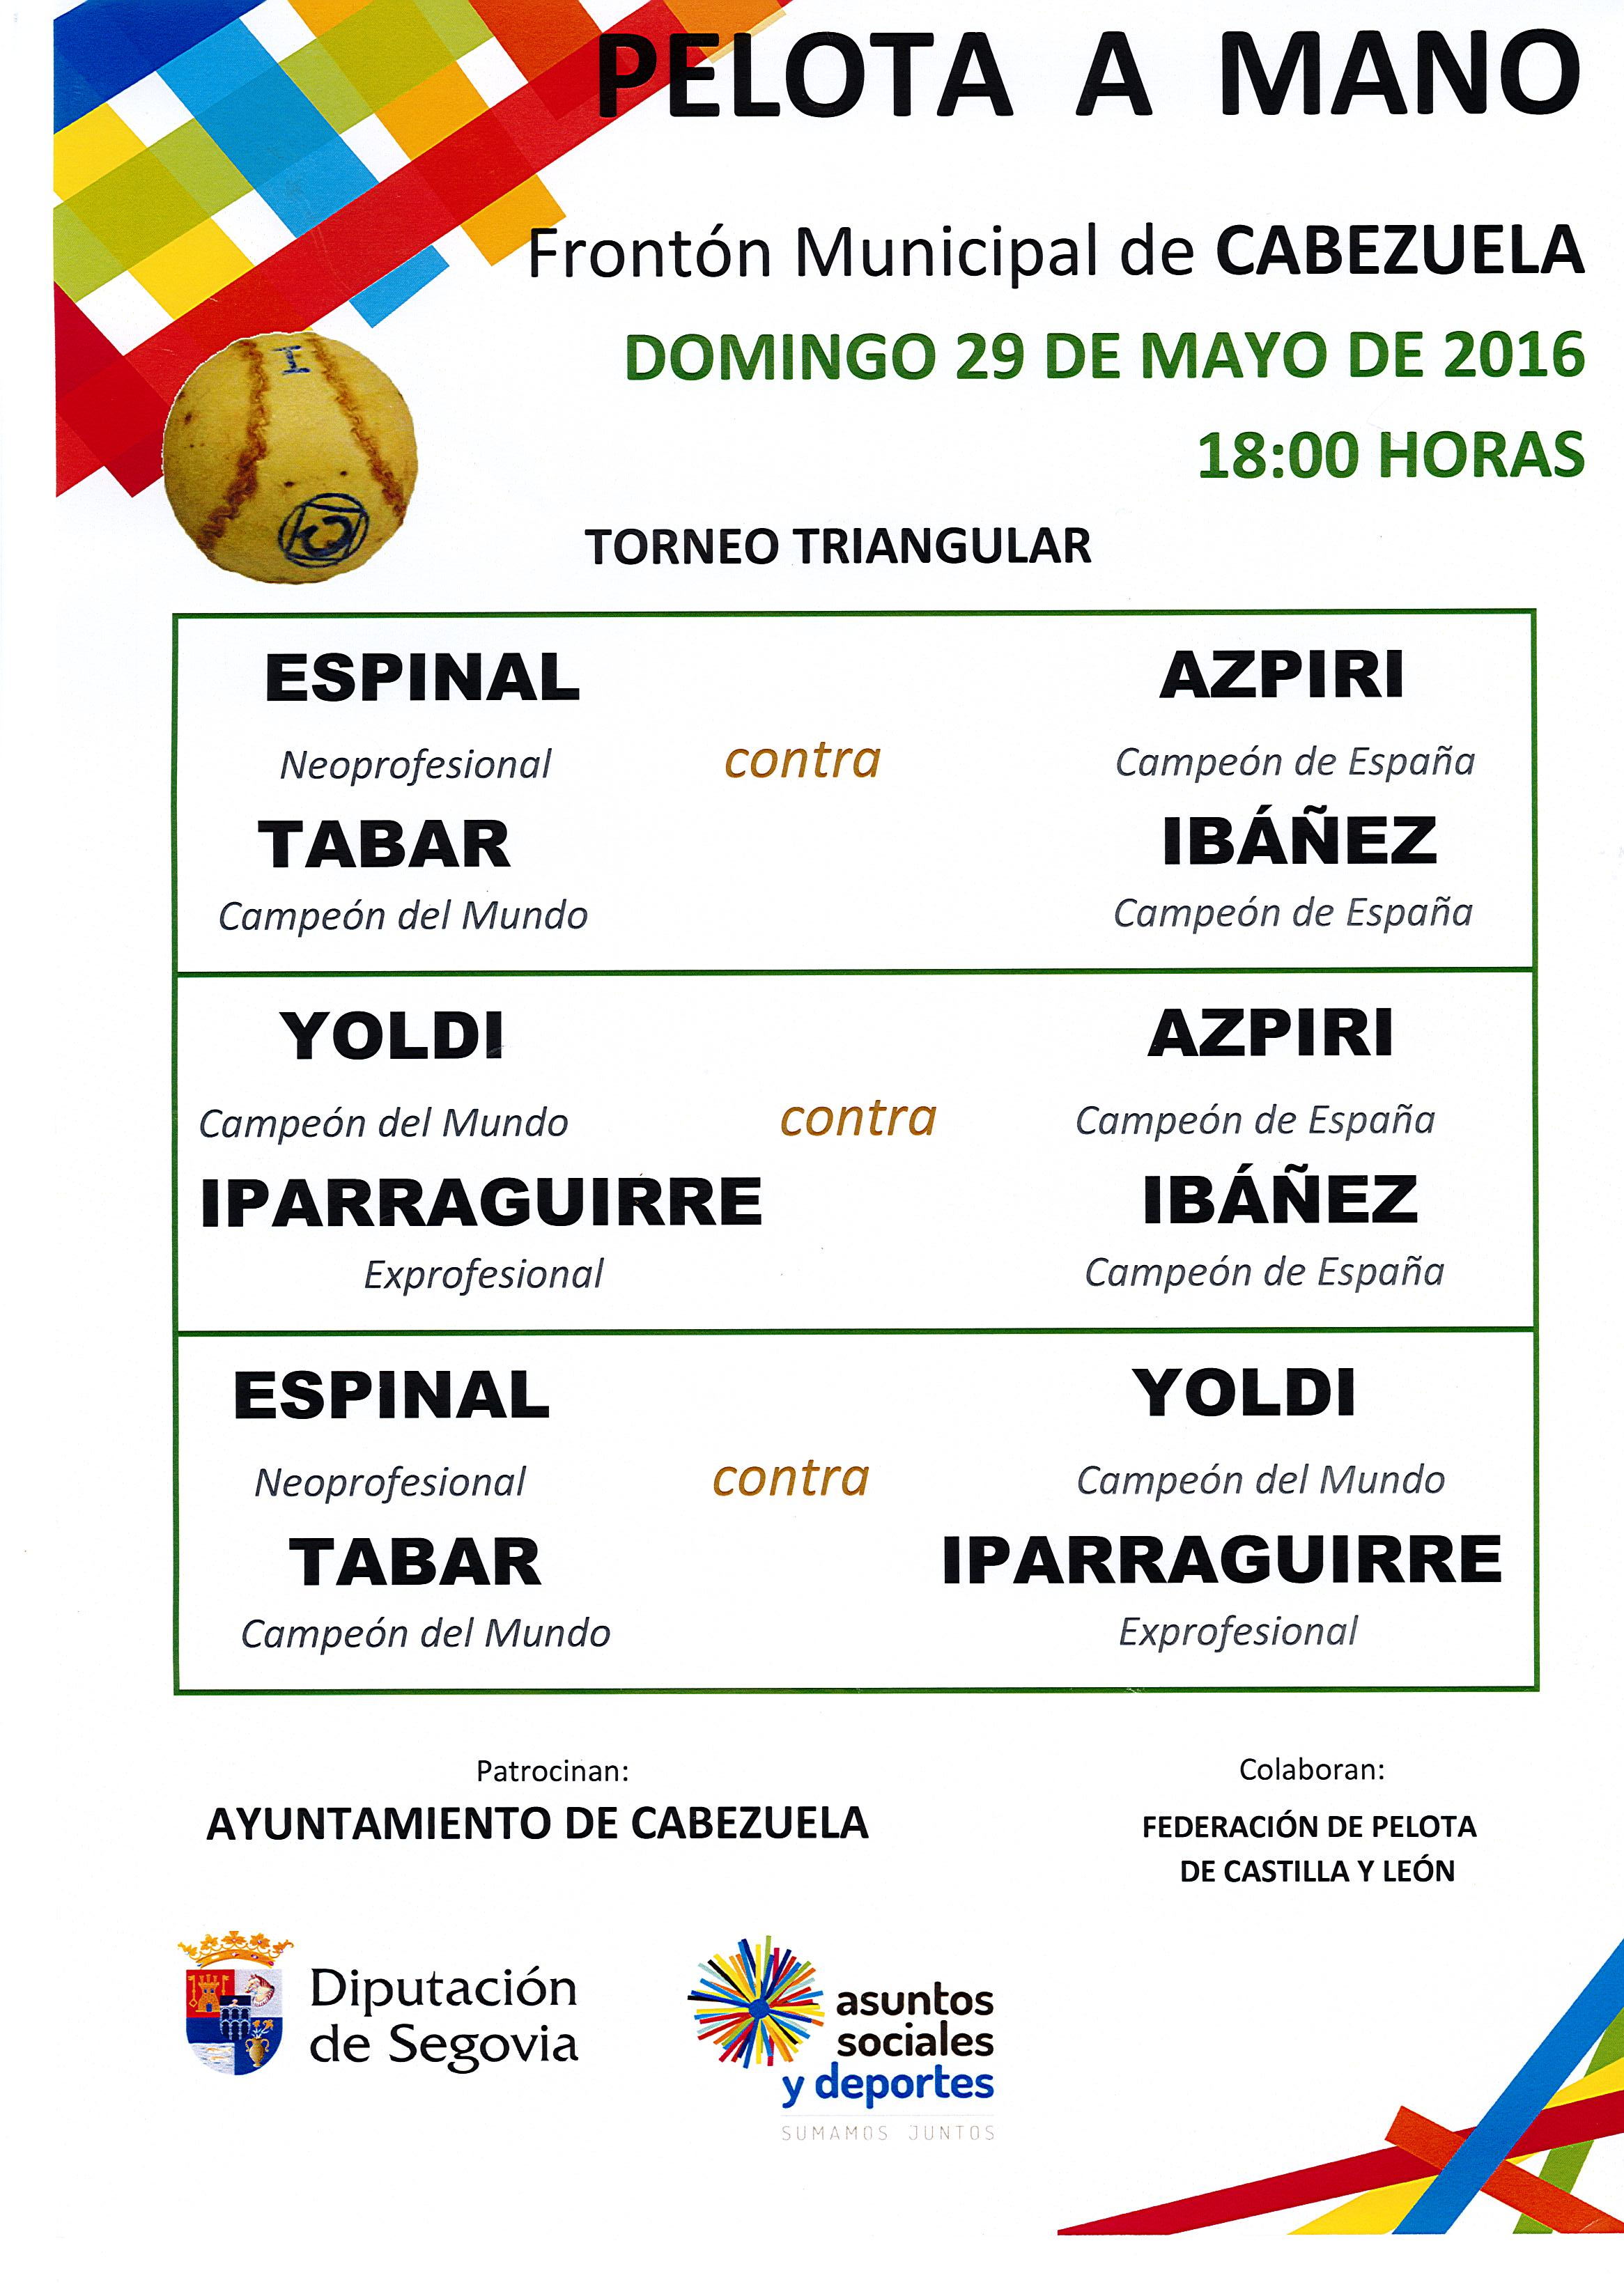 Gran partido de Pelota a mano Triangular en Cabezuela